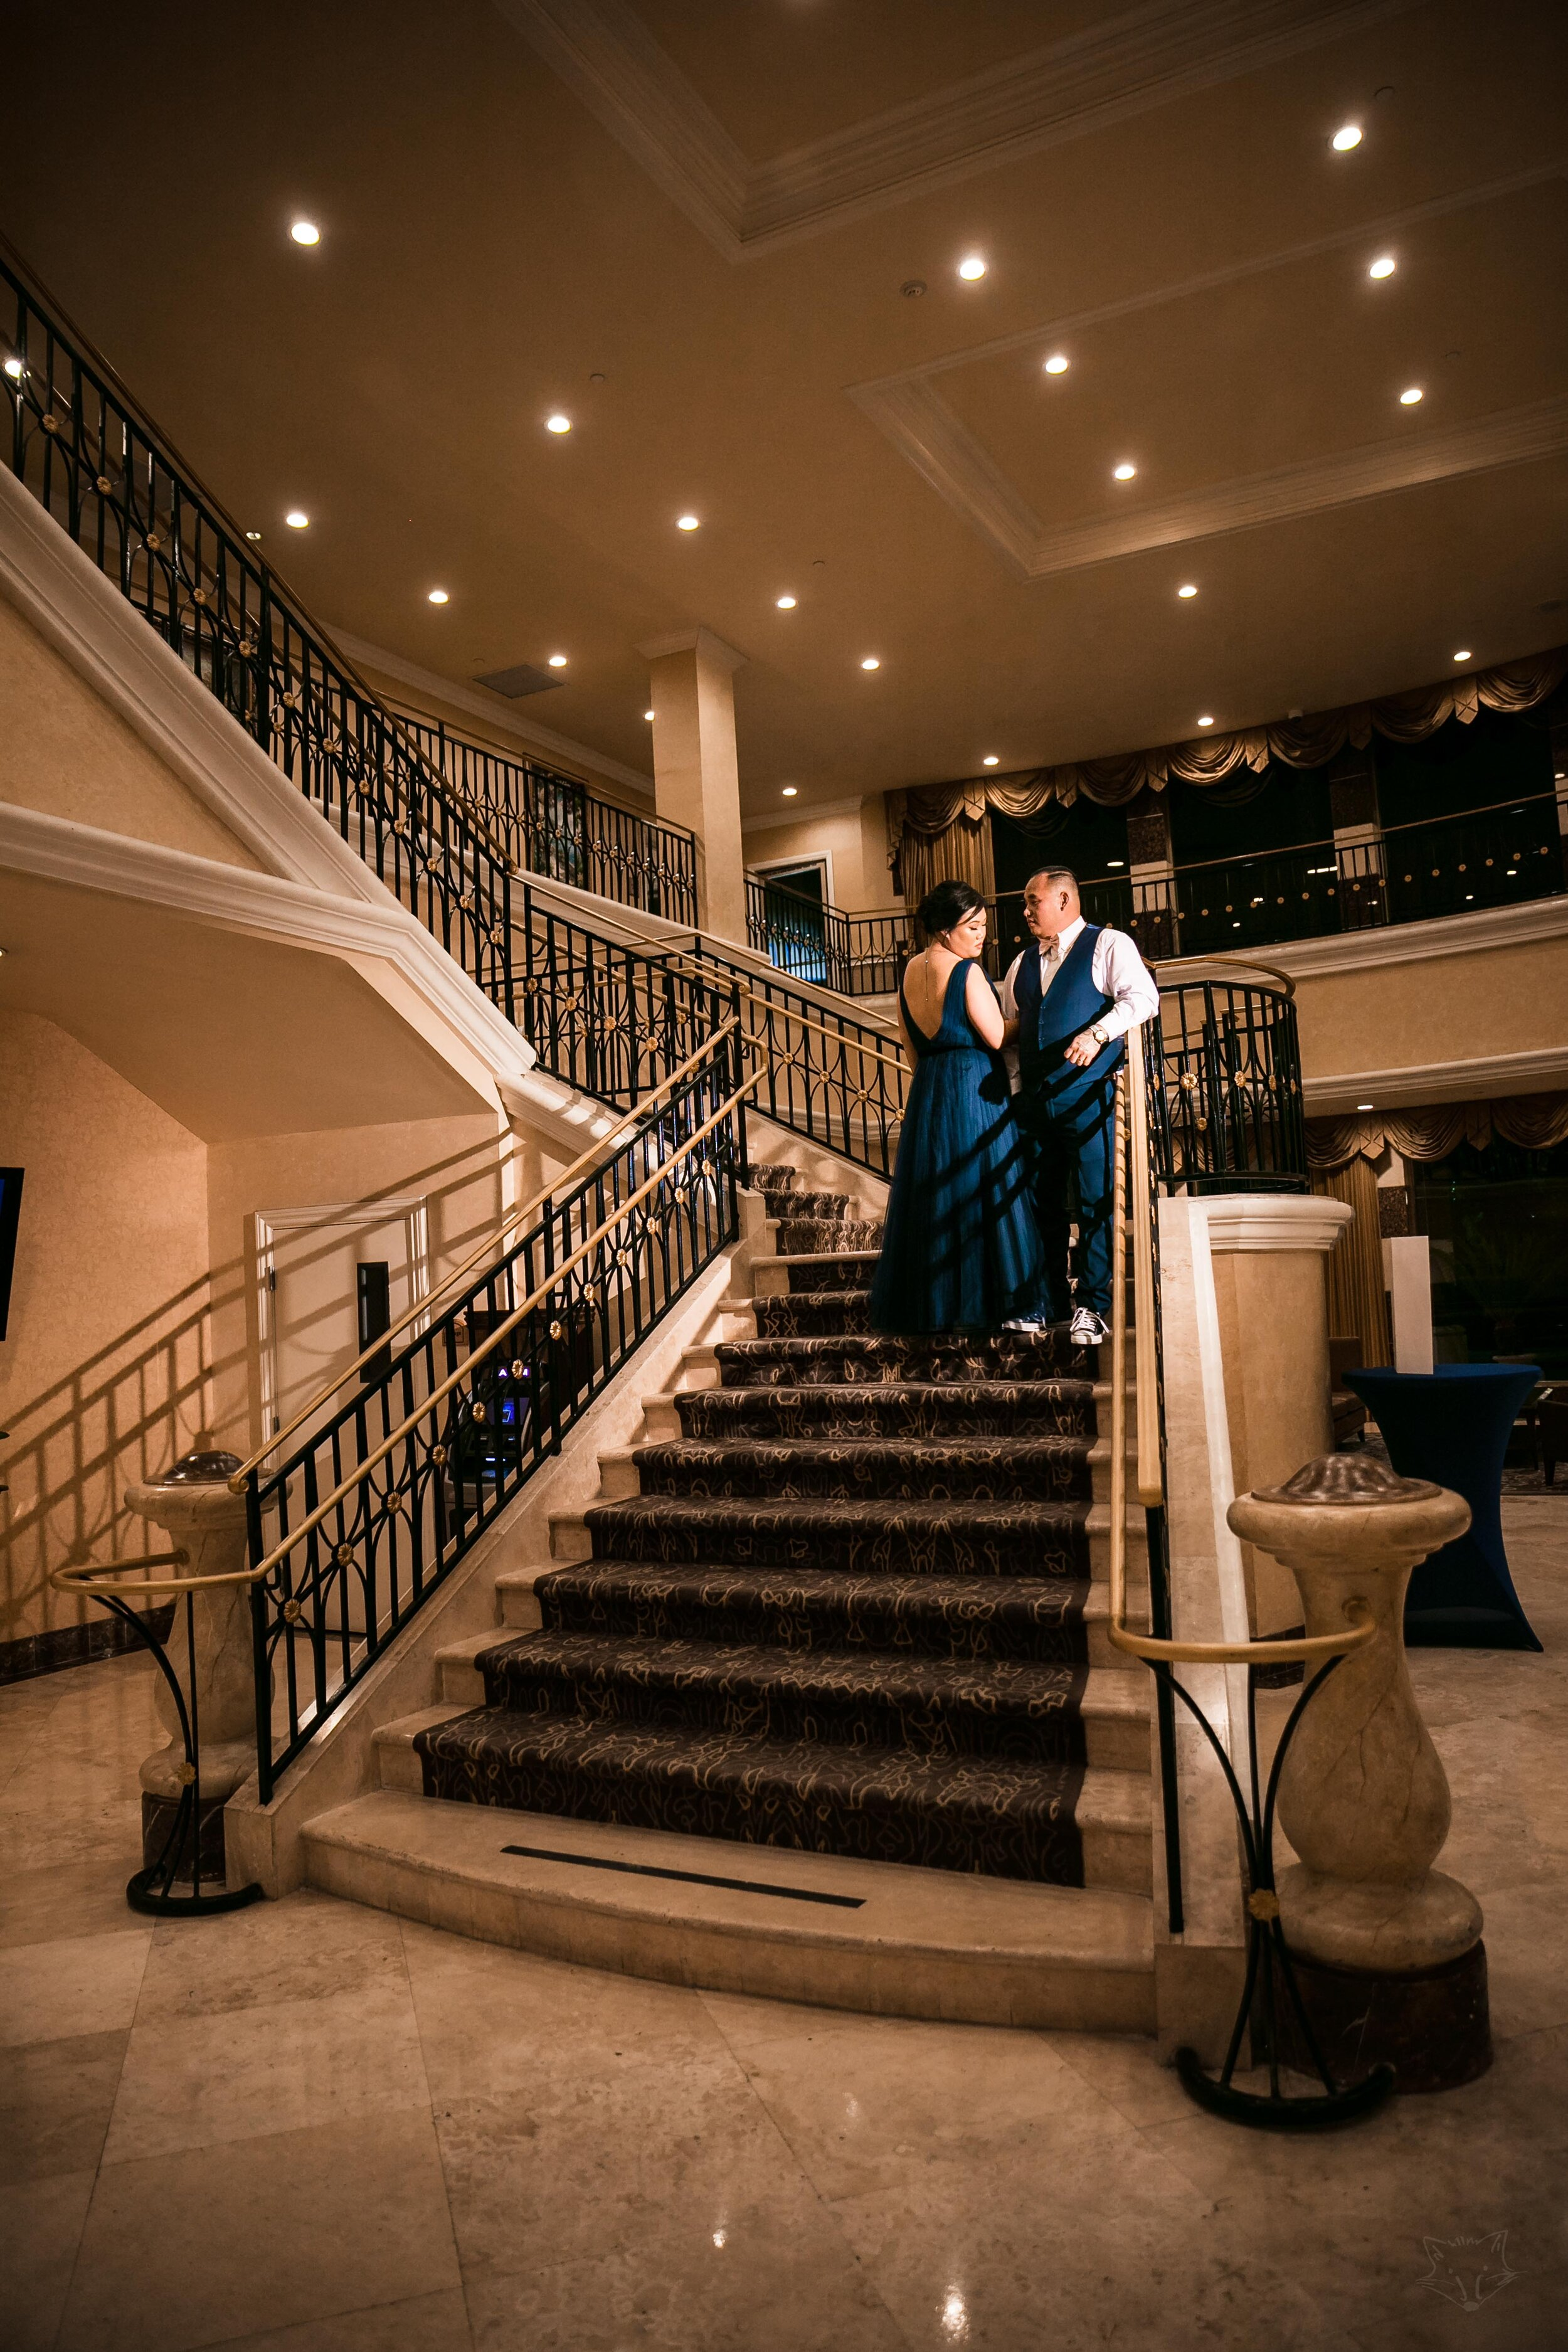 san_gabriel_hilton_wedding_joshua_chun_photography-0291.jpg